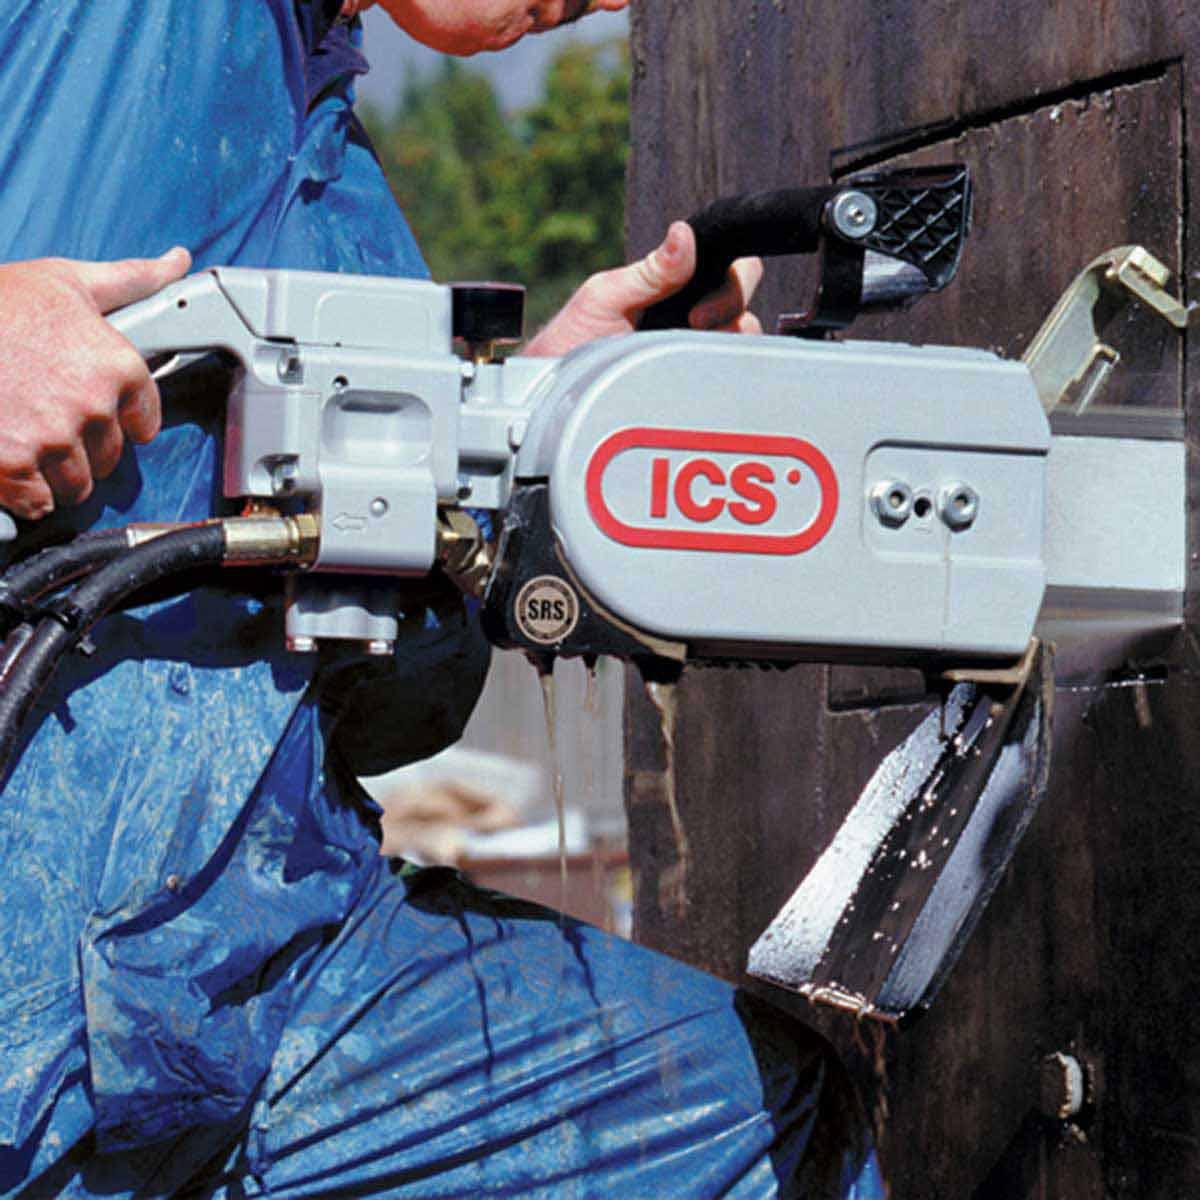 ICS Chain saw concrete cutting